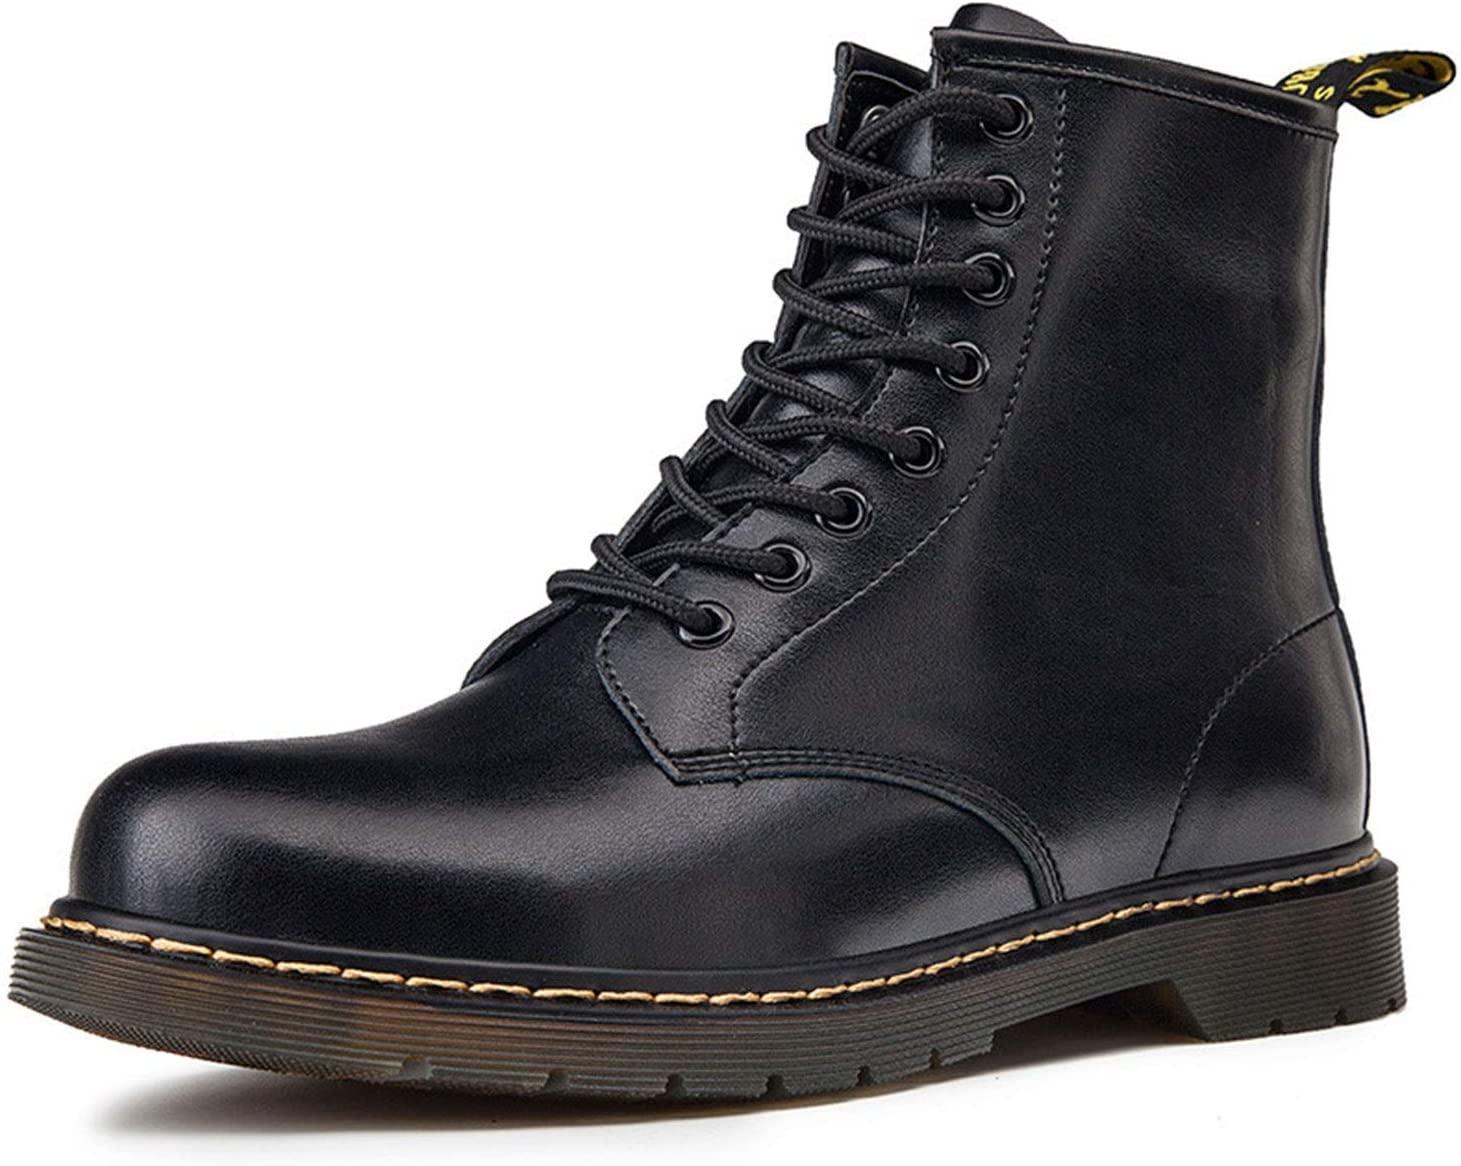 QLT Men's Martin Boots,Waterproof Boot,Stylish 8-Eye Leather Shoes (Color : Black, Size : US 6.5/UK 5.5/EU 38/JP 24)